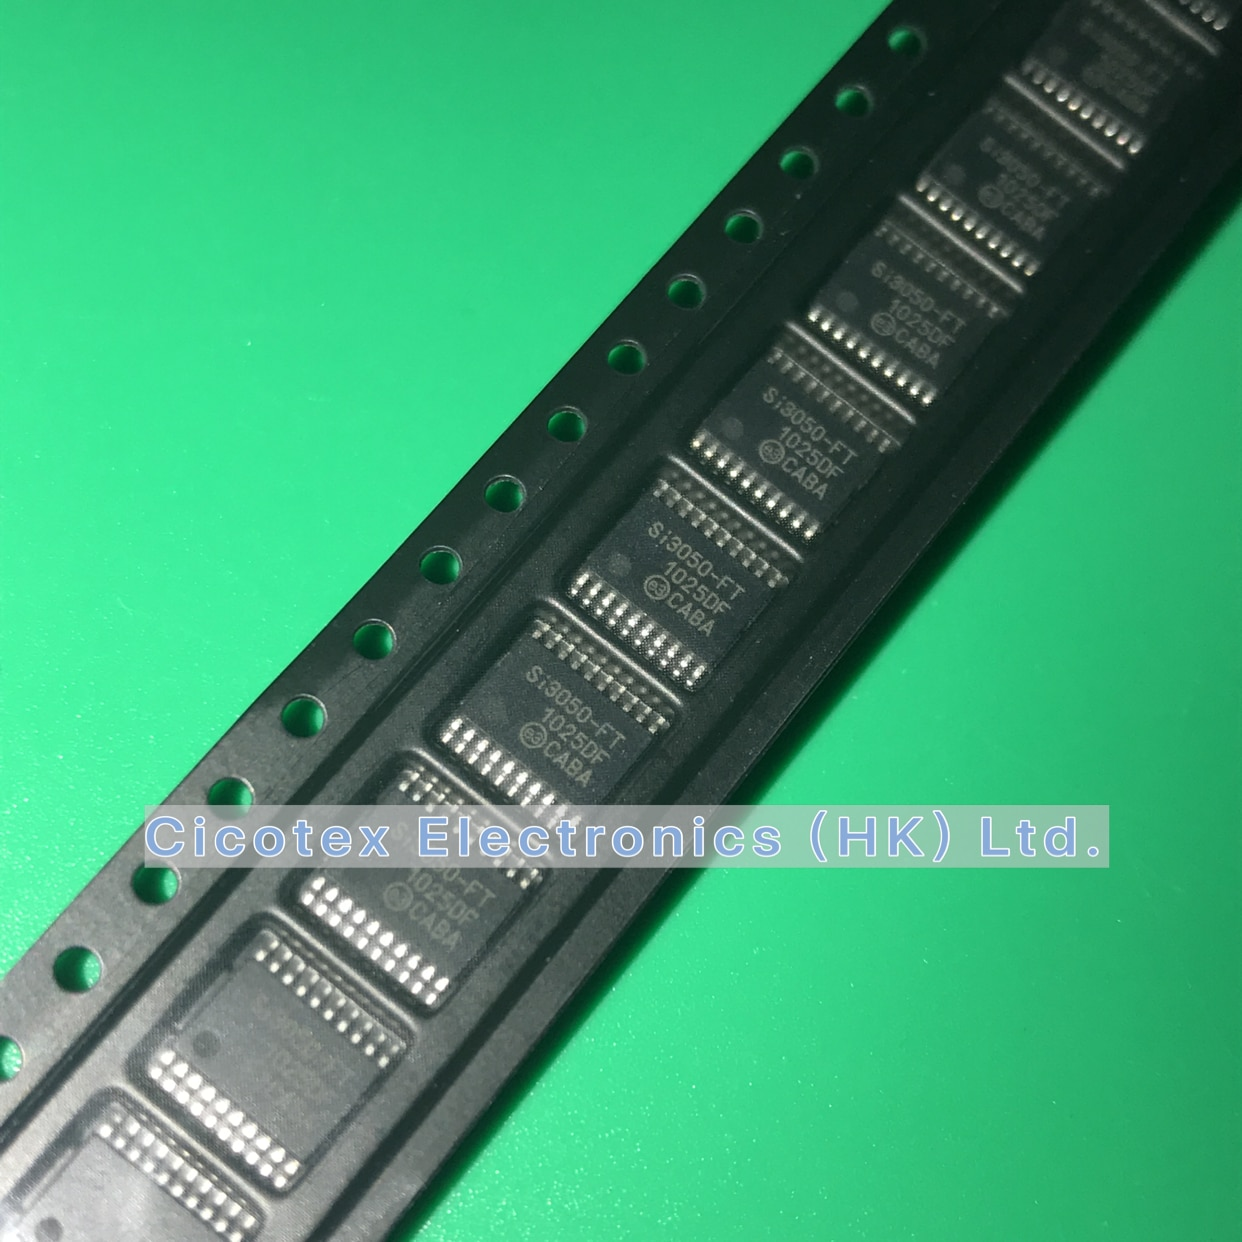 4 unids/lote SI3050-FT TSSOP20 SI-3050-FT IC TELECOM interfaz 20TSSOP SI3050FT SI3050-D-FT SI3050-E1-FTR SI3050-E-FT